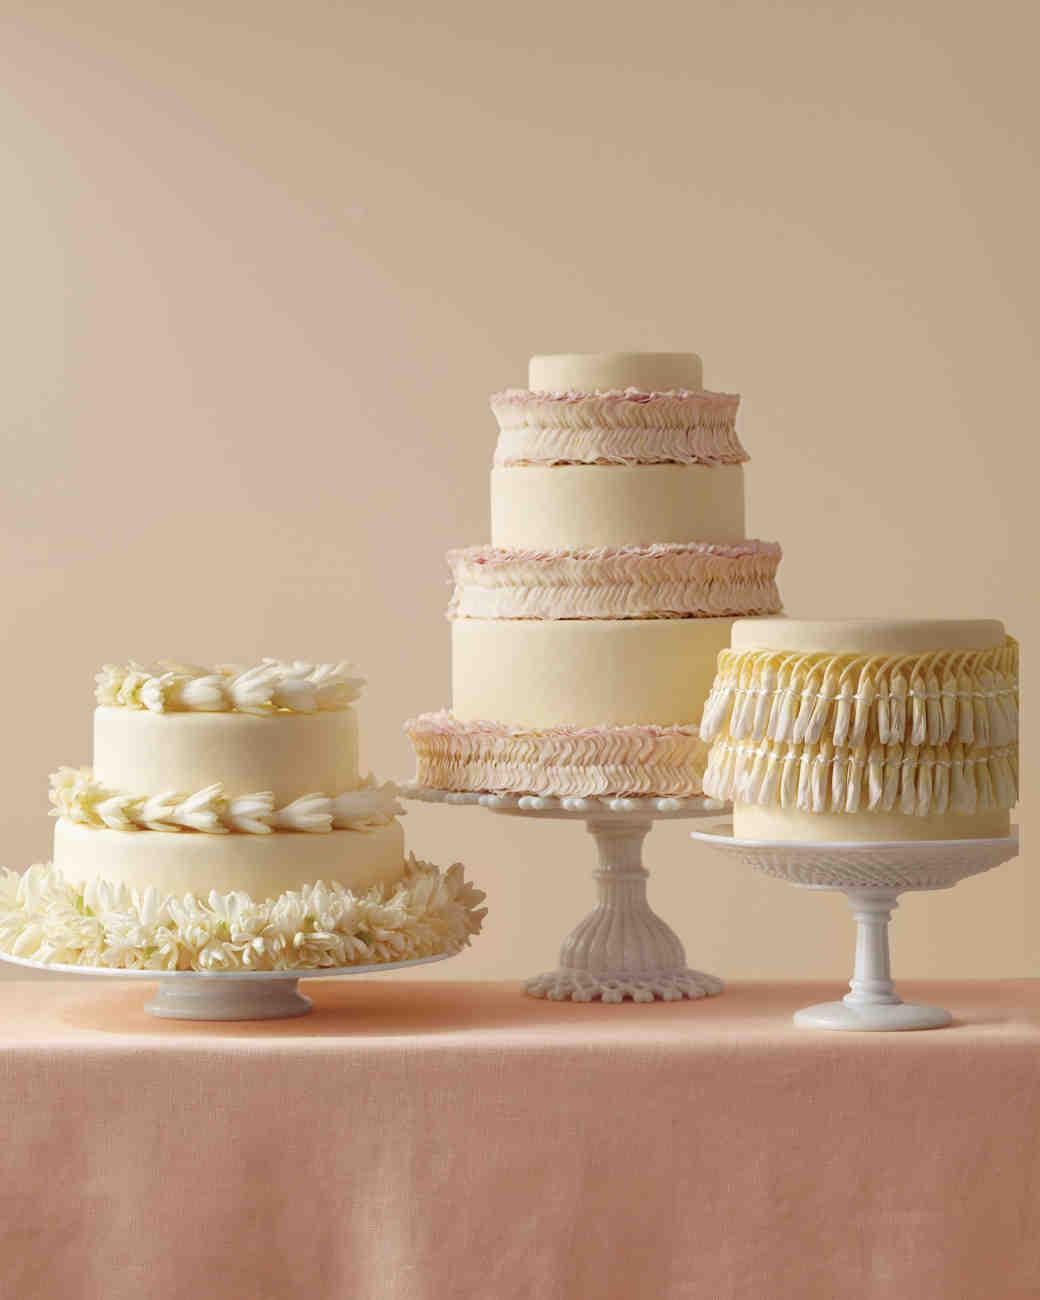 cakes04r-v2-sum11mwd107083.jpg